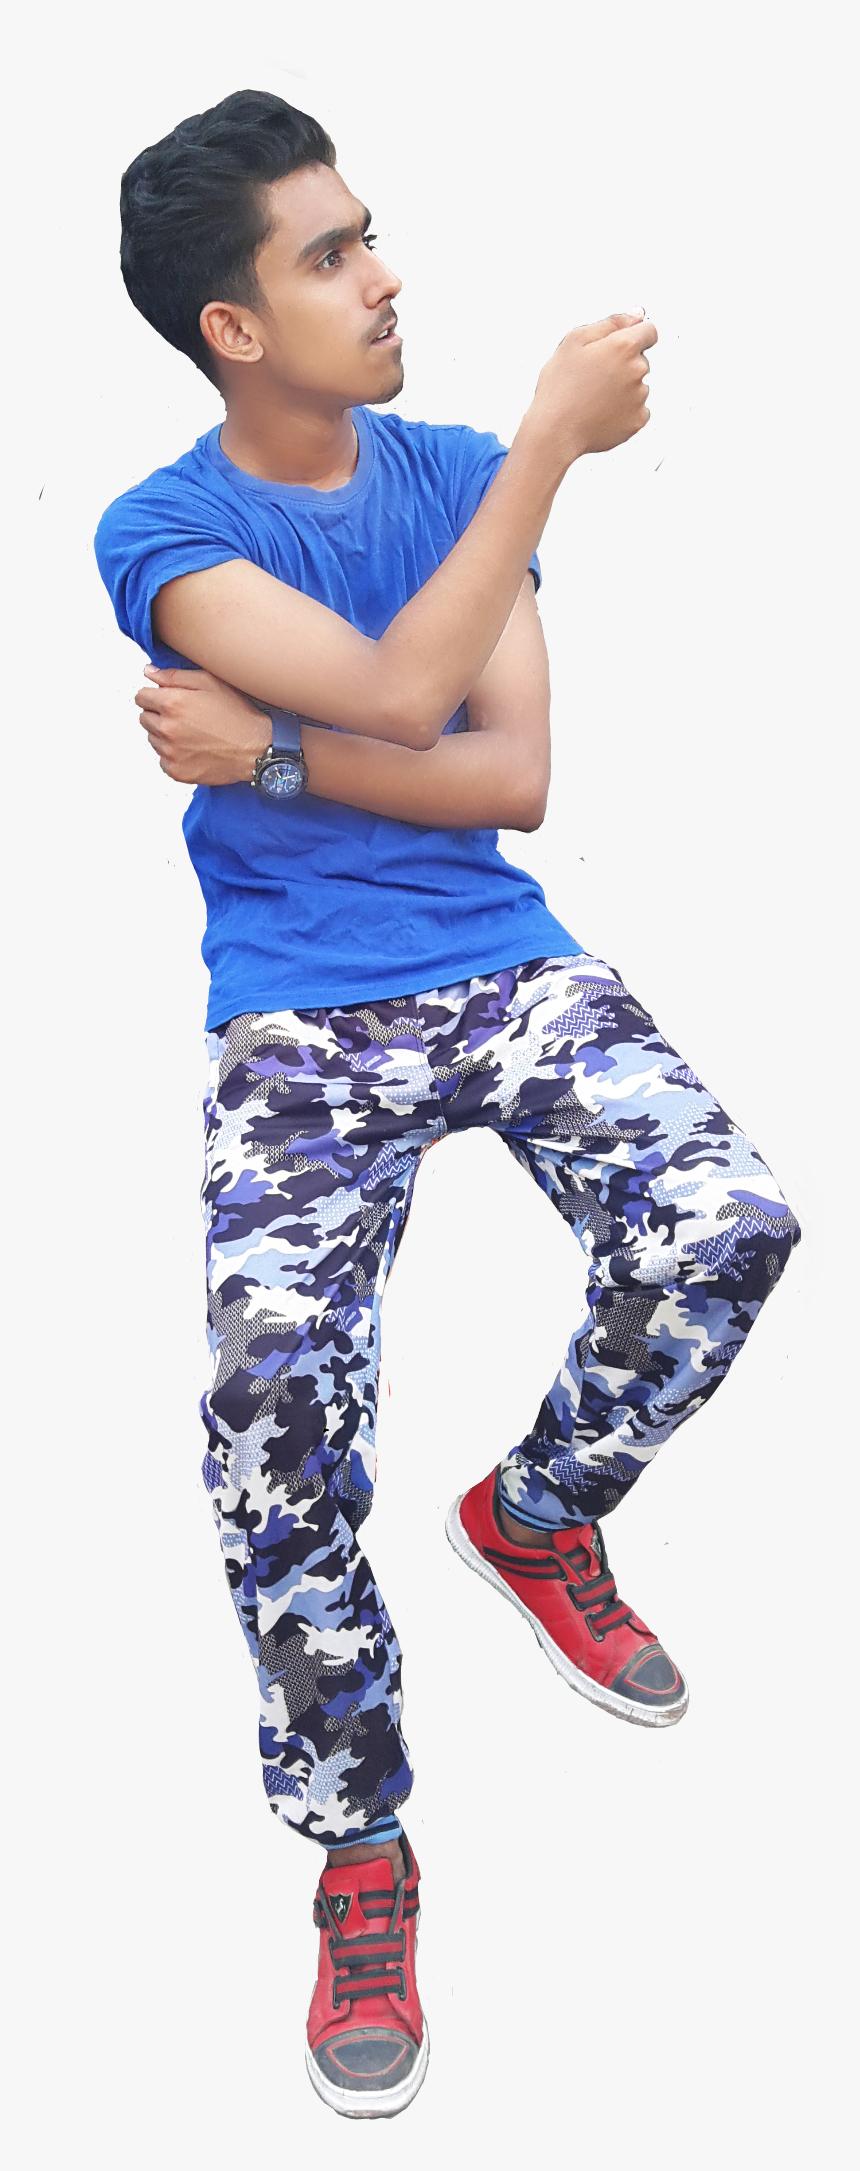 Independence Day Photoediting Model Png - Pajamas, Transparent Png, Free Download